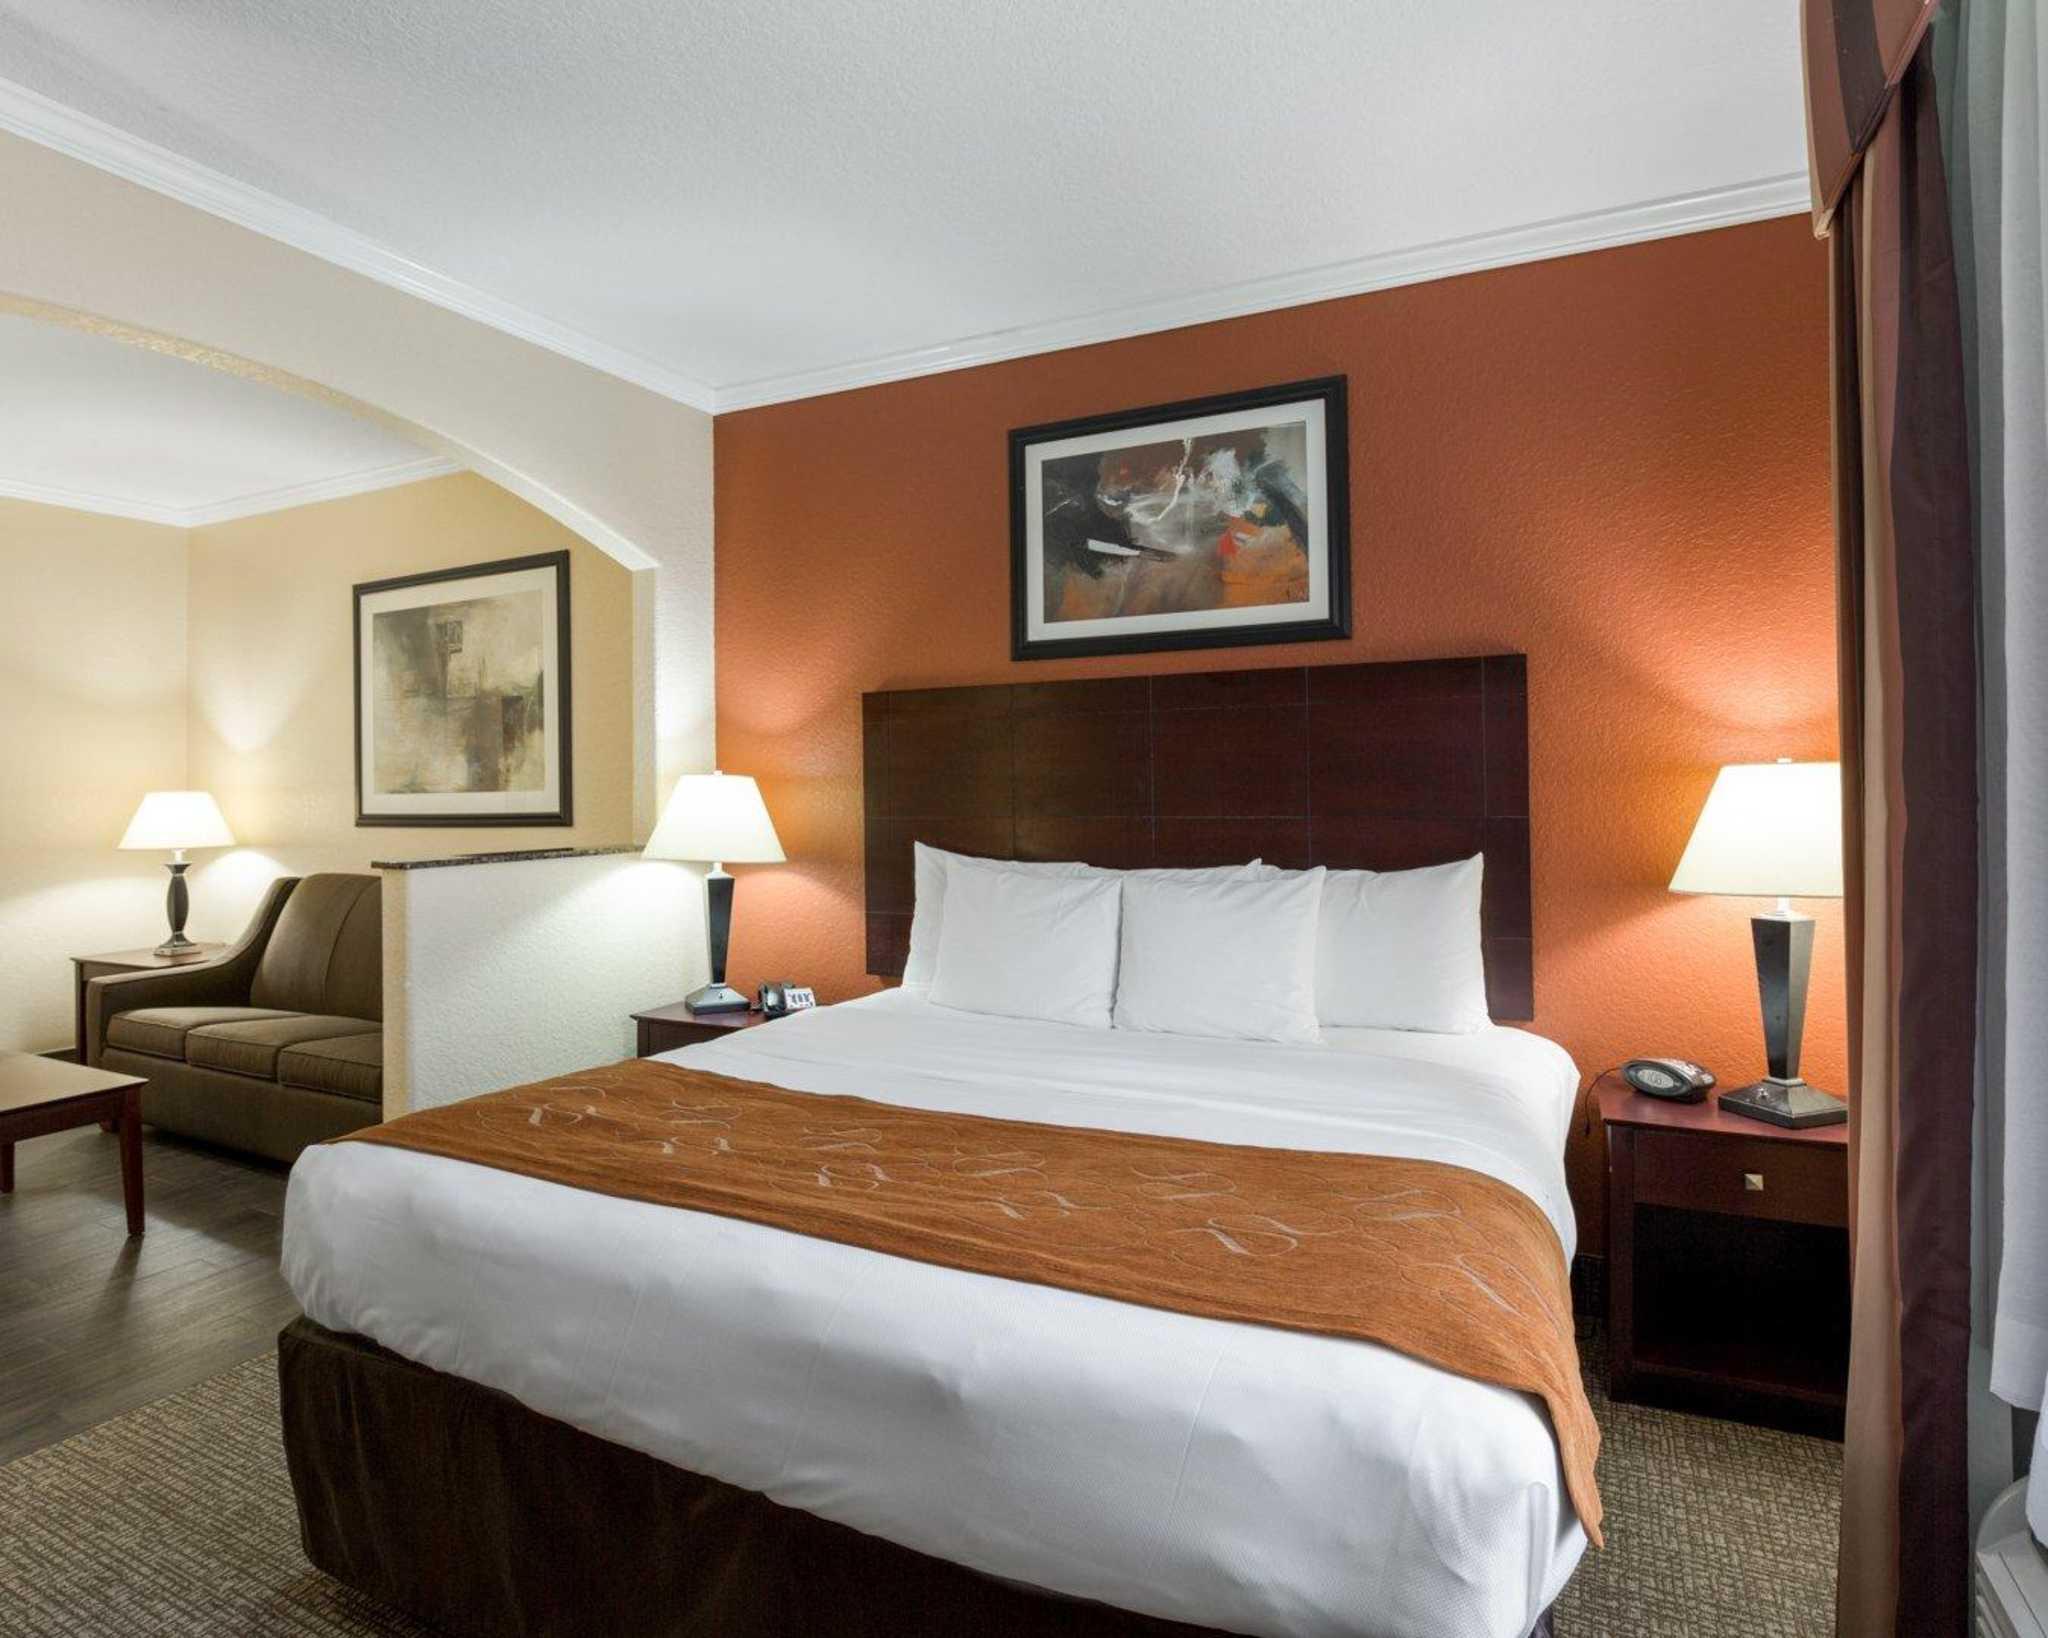 Comfort Suites image 47